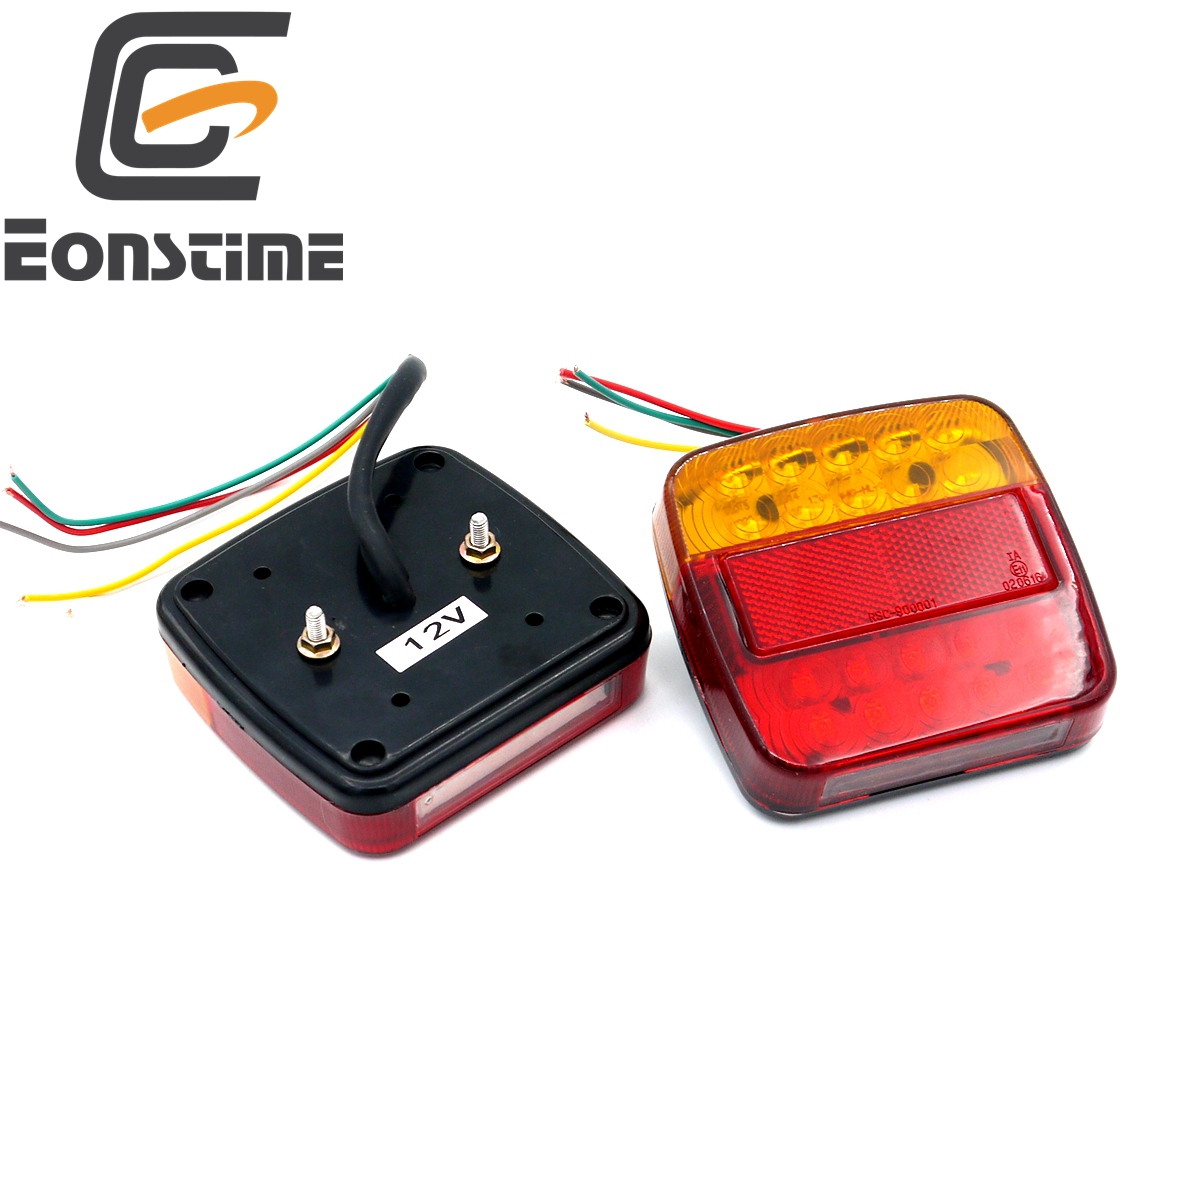 Eonstime 2 unids 12 V Remolques camión 20 luz trasera LED luz trasera Lámparas freno 6 led placa de luz de lámpara